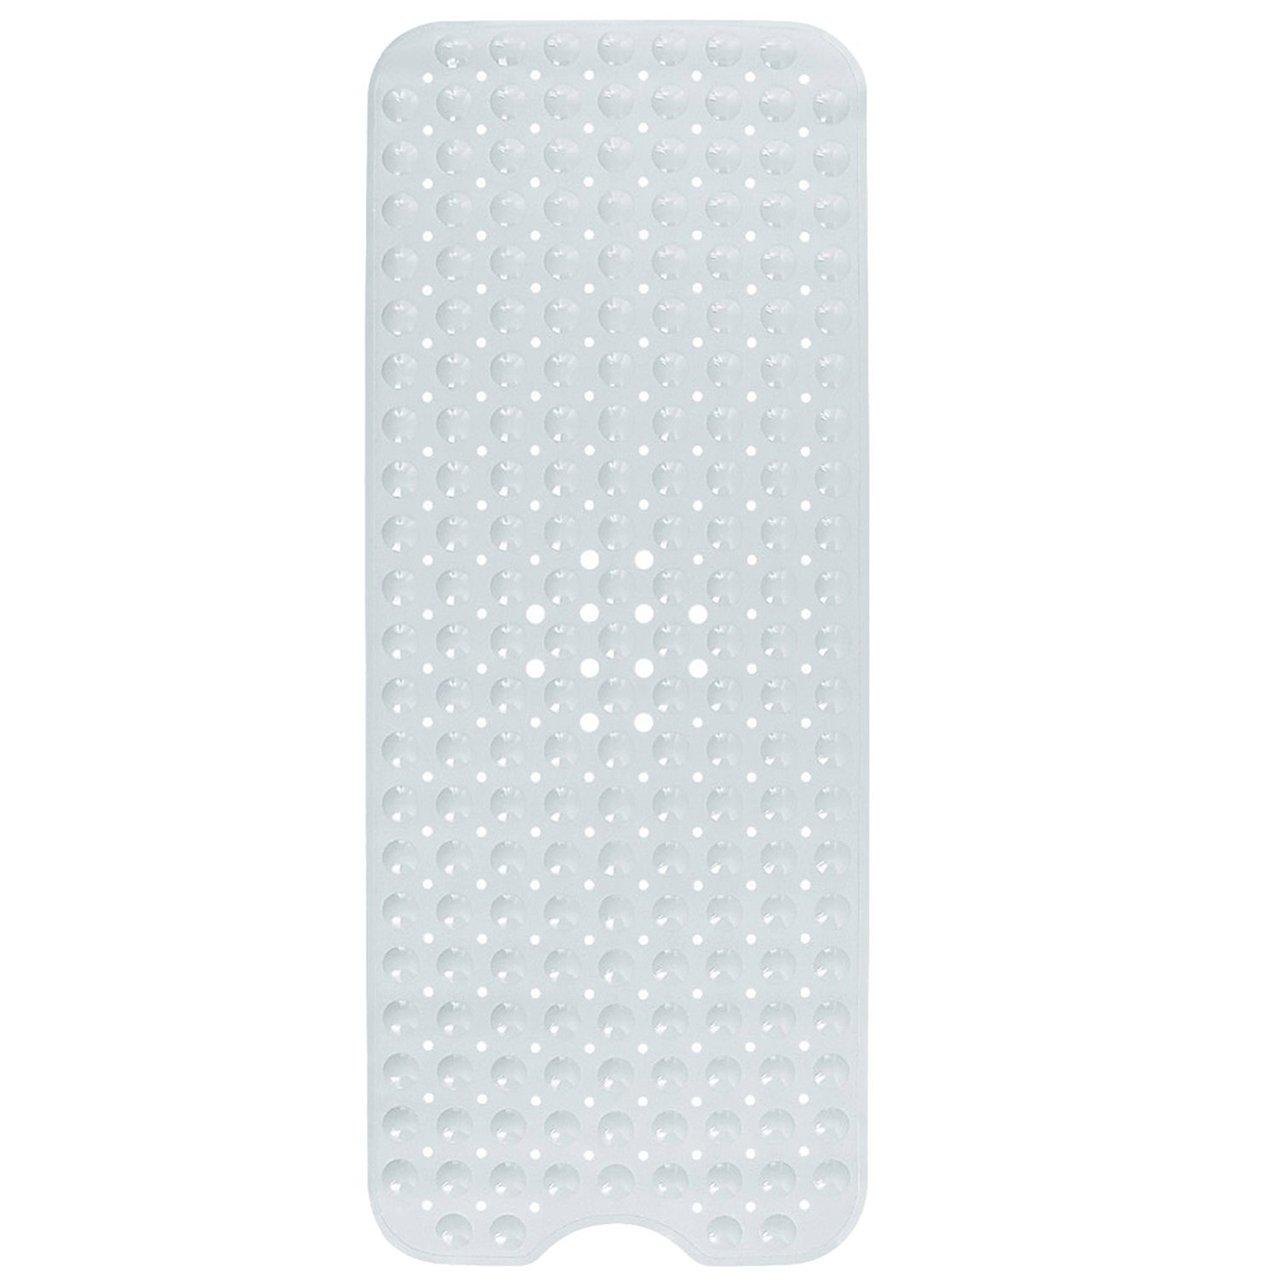 LIVINGbasics Anti-Bacterial Anti-Slip-Resistant Bath Mat, 16 W x 39 L, Extra Long (White) 16 W x 39 L